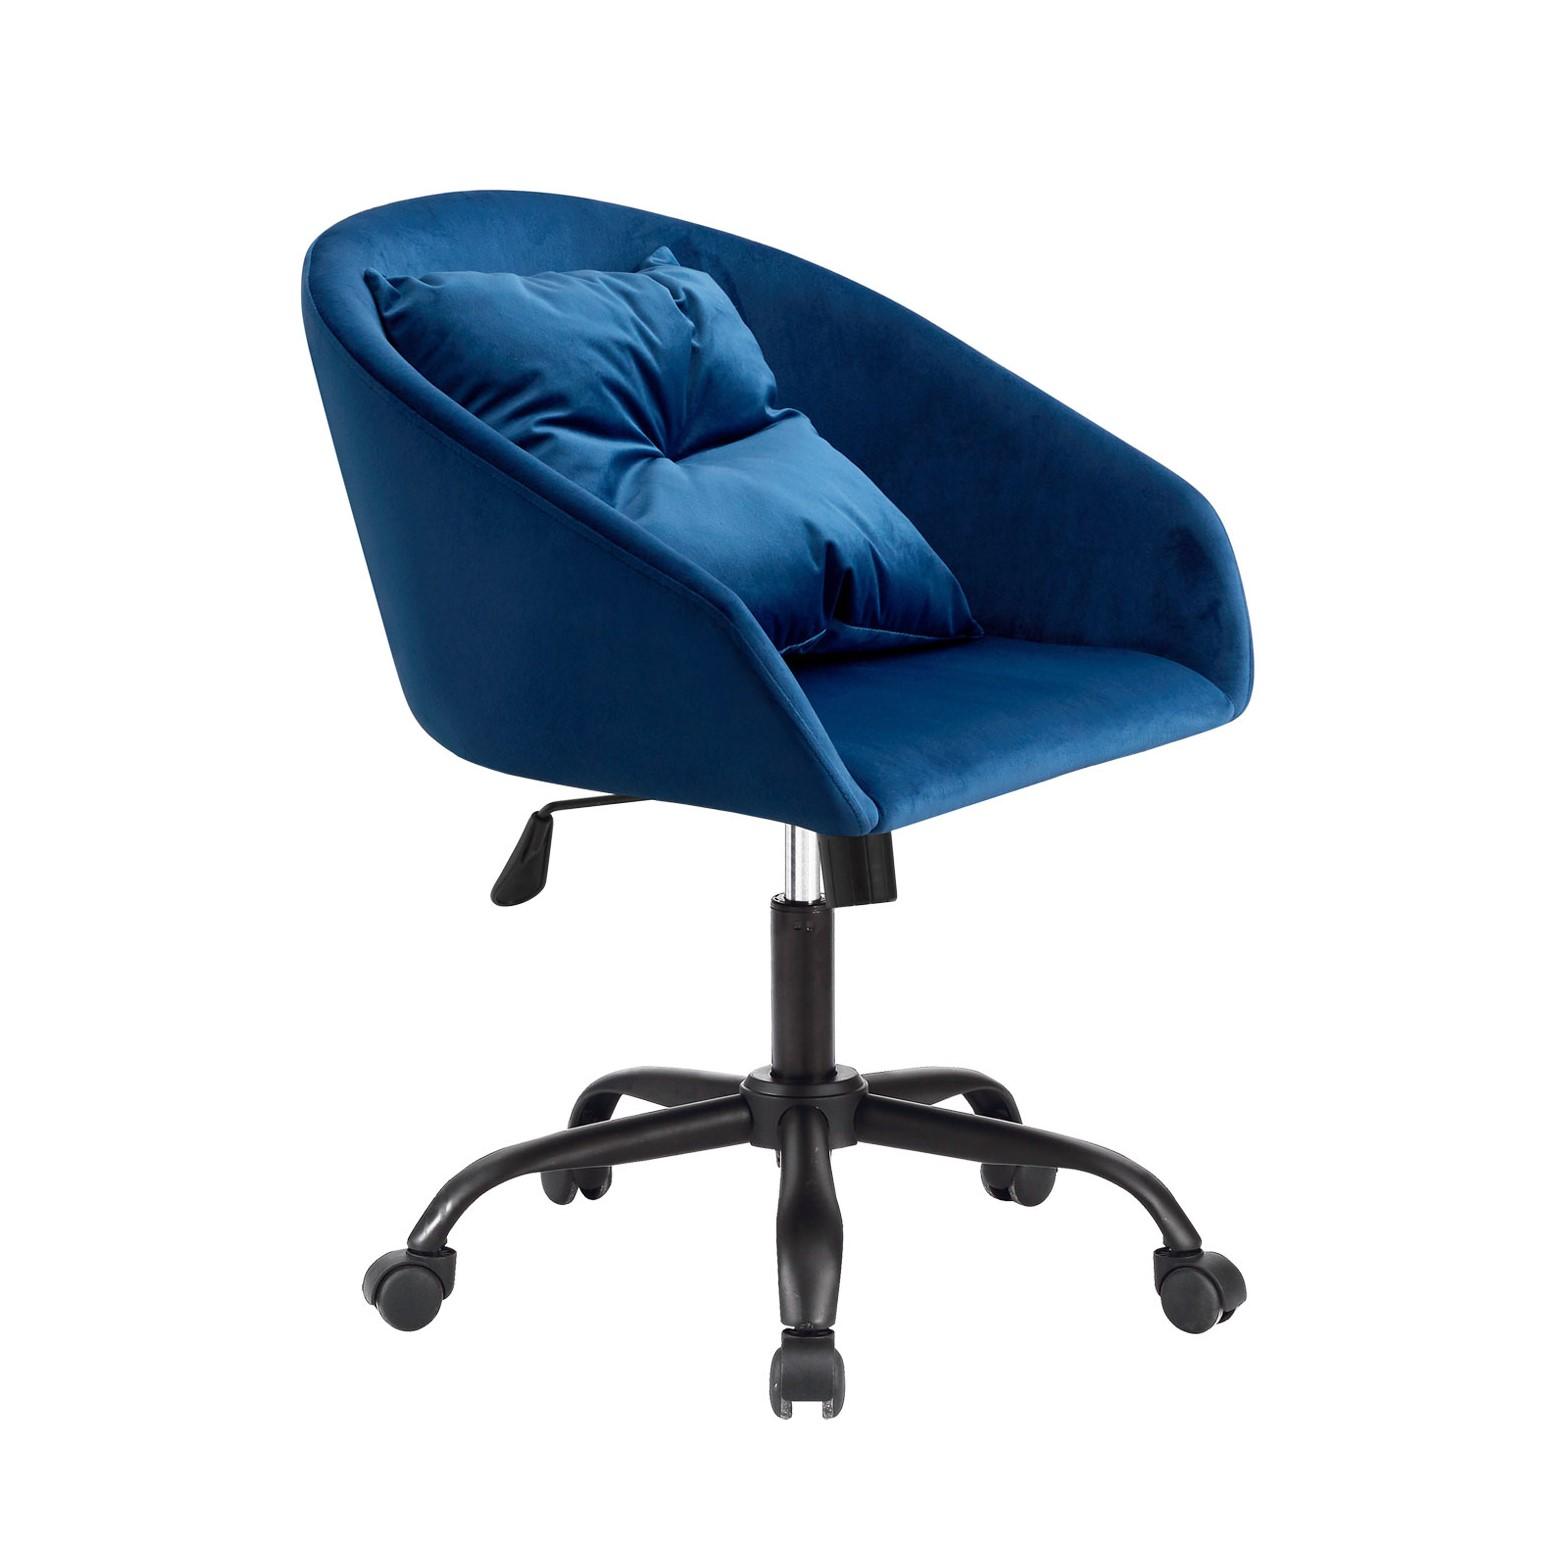 32386-silla-giratoria-velvet-azul.jpg